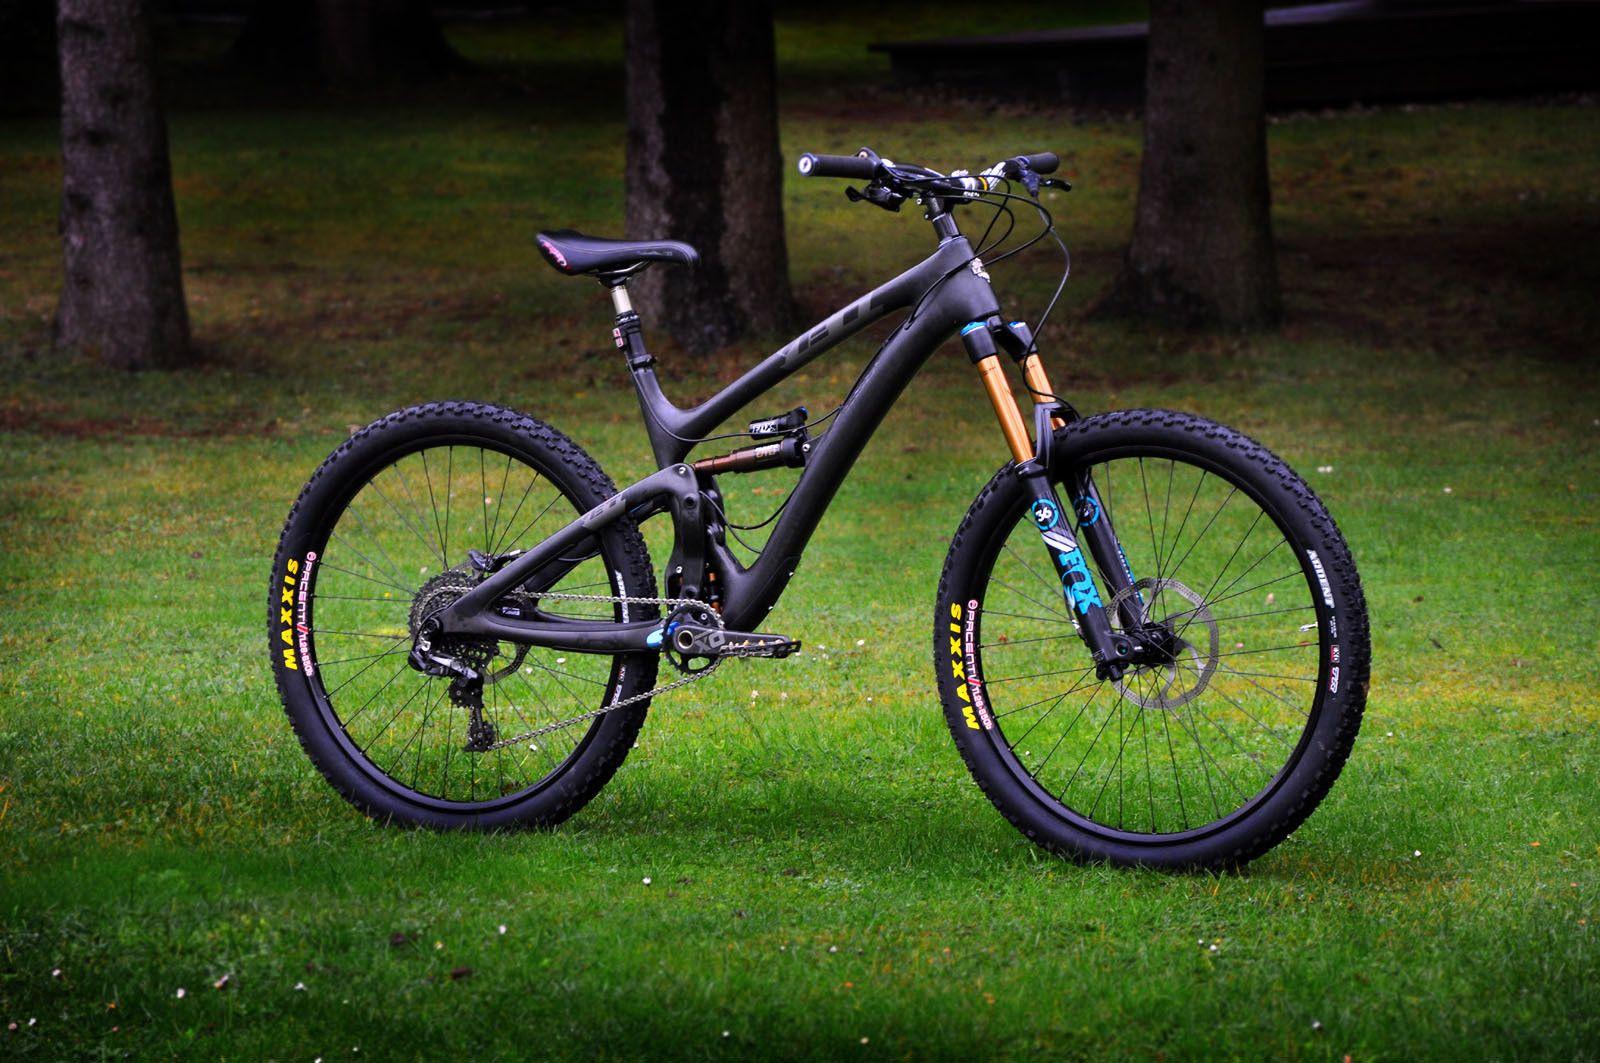 c5044cadb65 Yeti SB6c carbon custom - bike.insel's Bike Check - Vital MTB ...